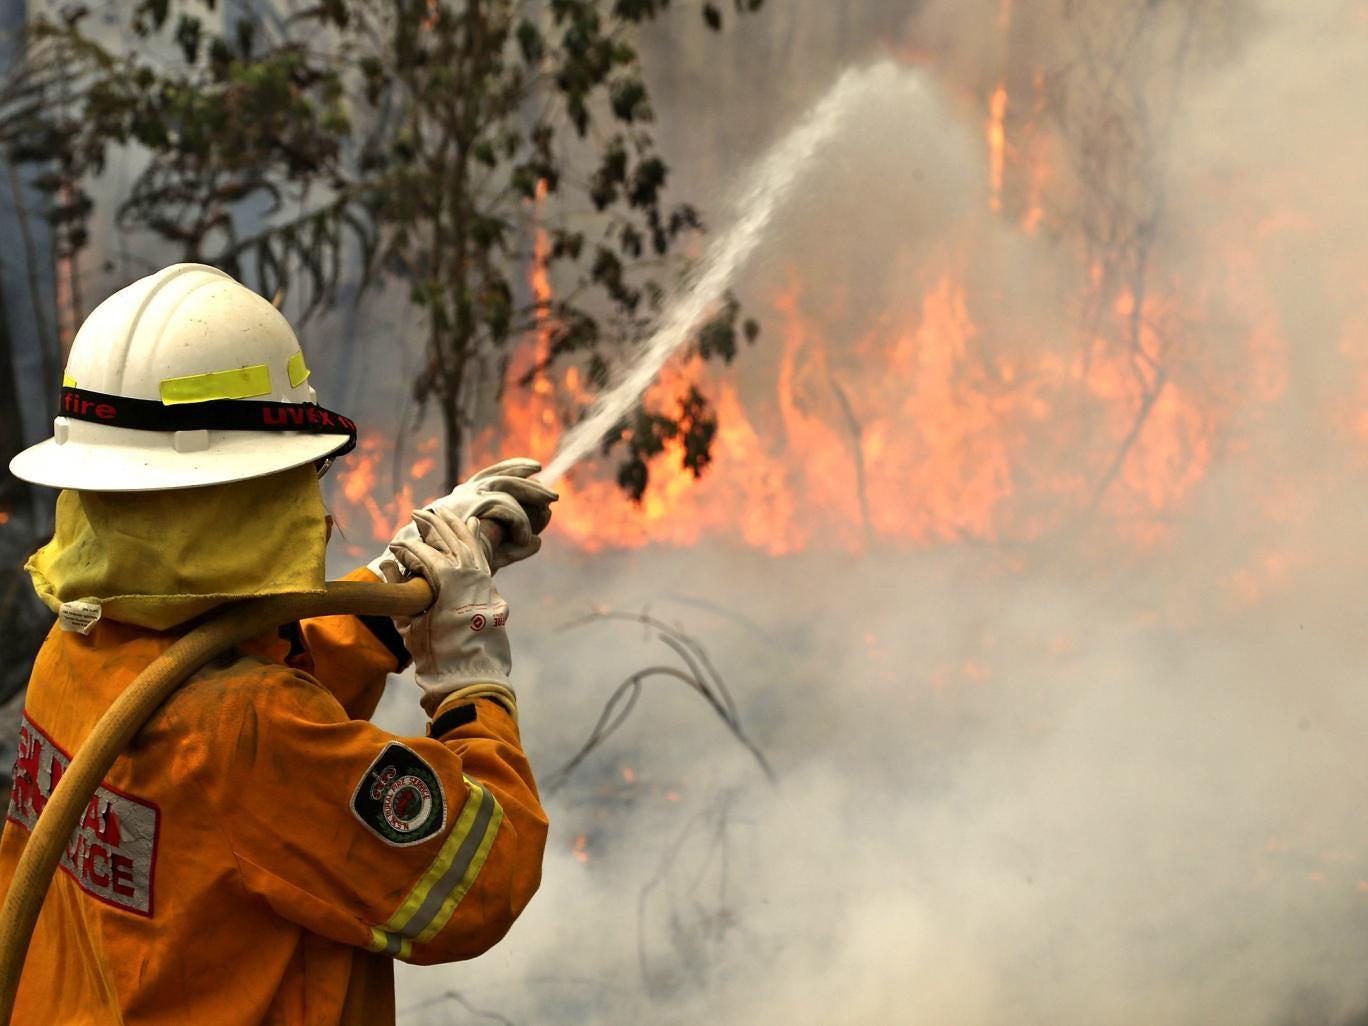 Fireman battles the flames at Bilpin, west of Sydney